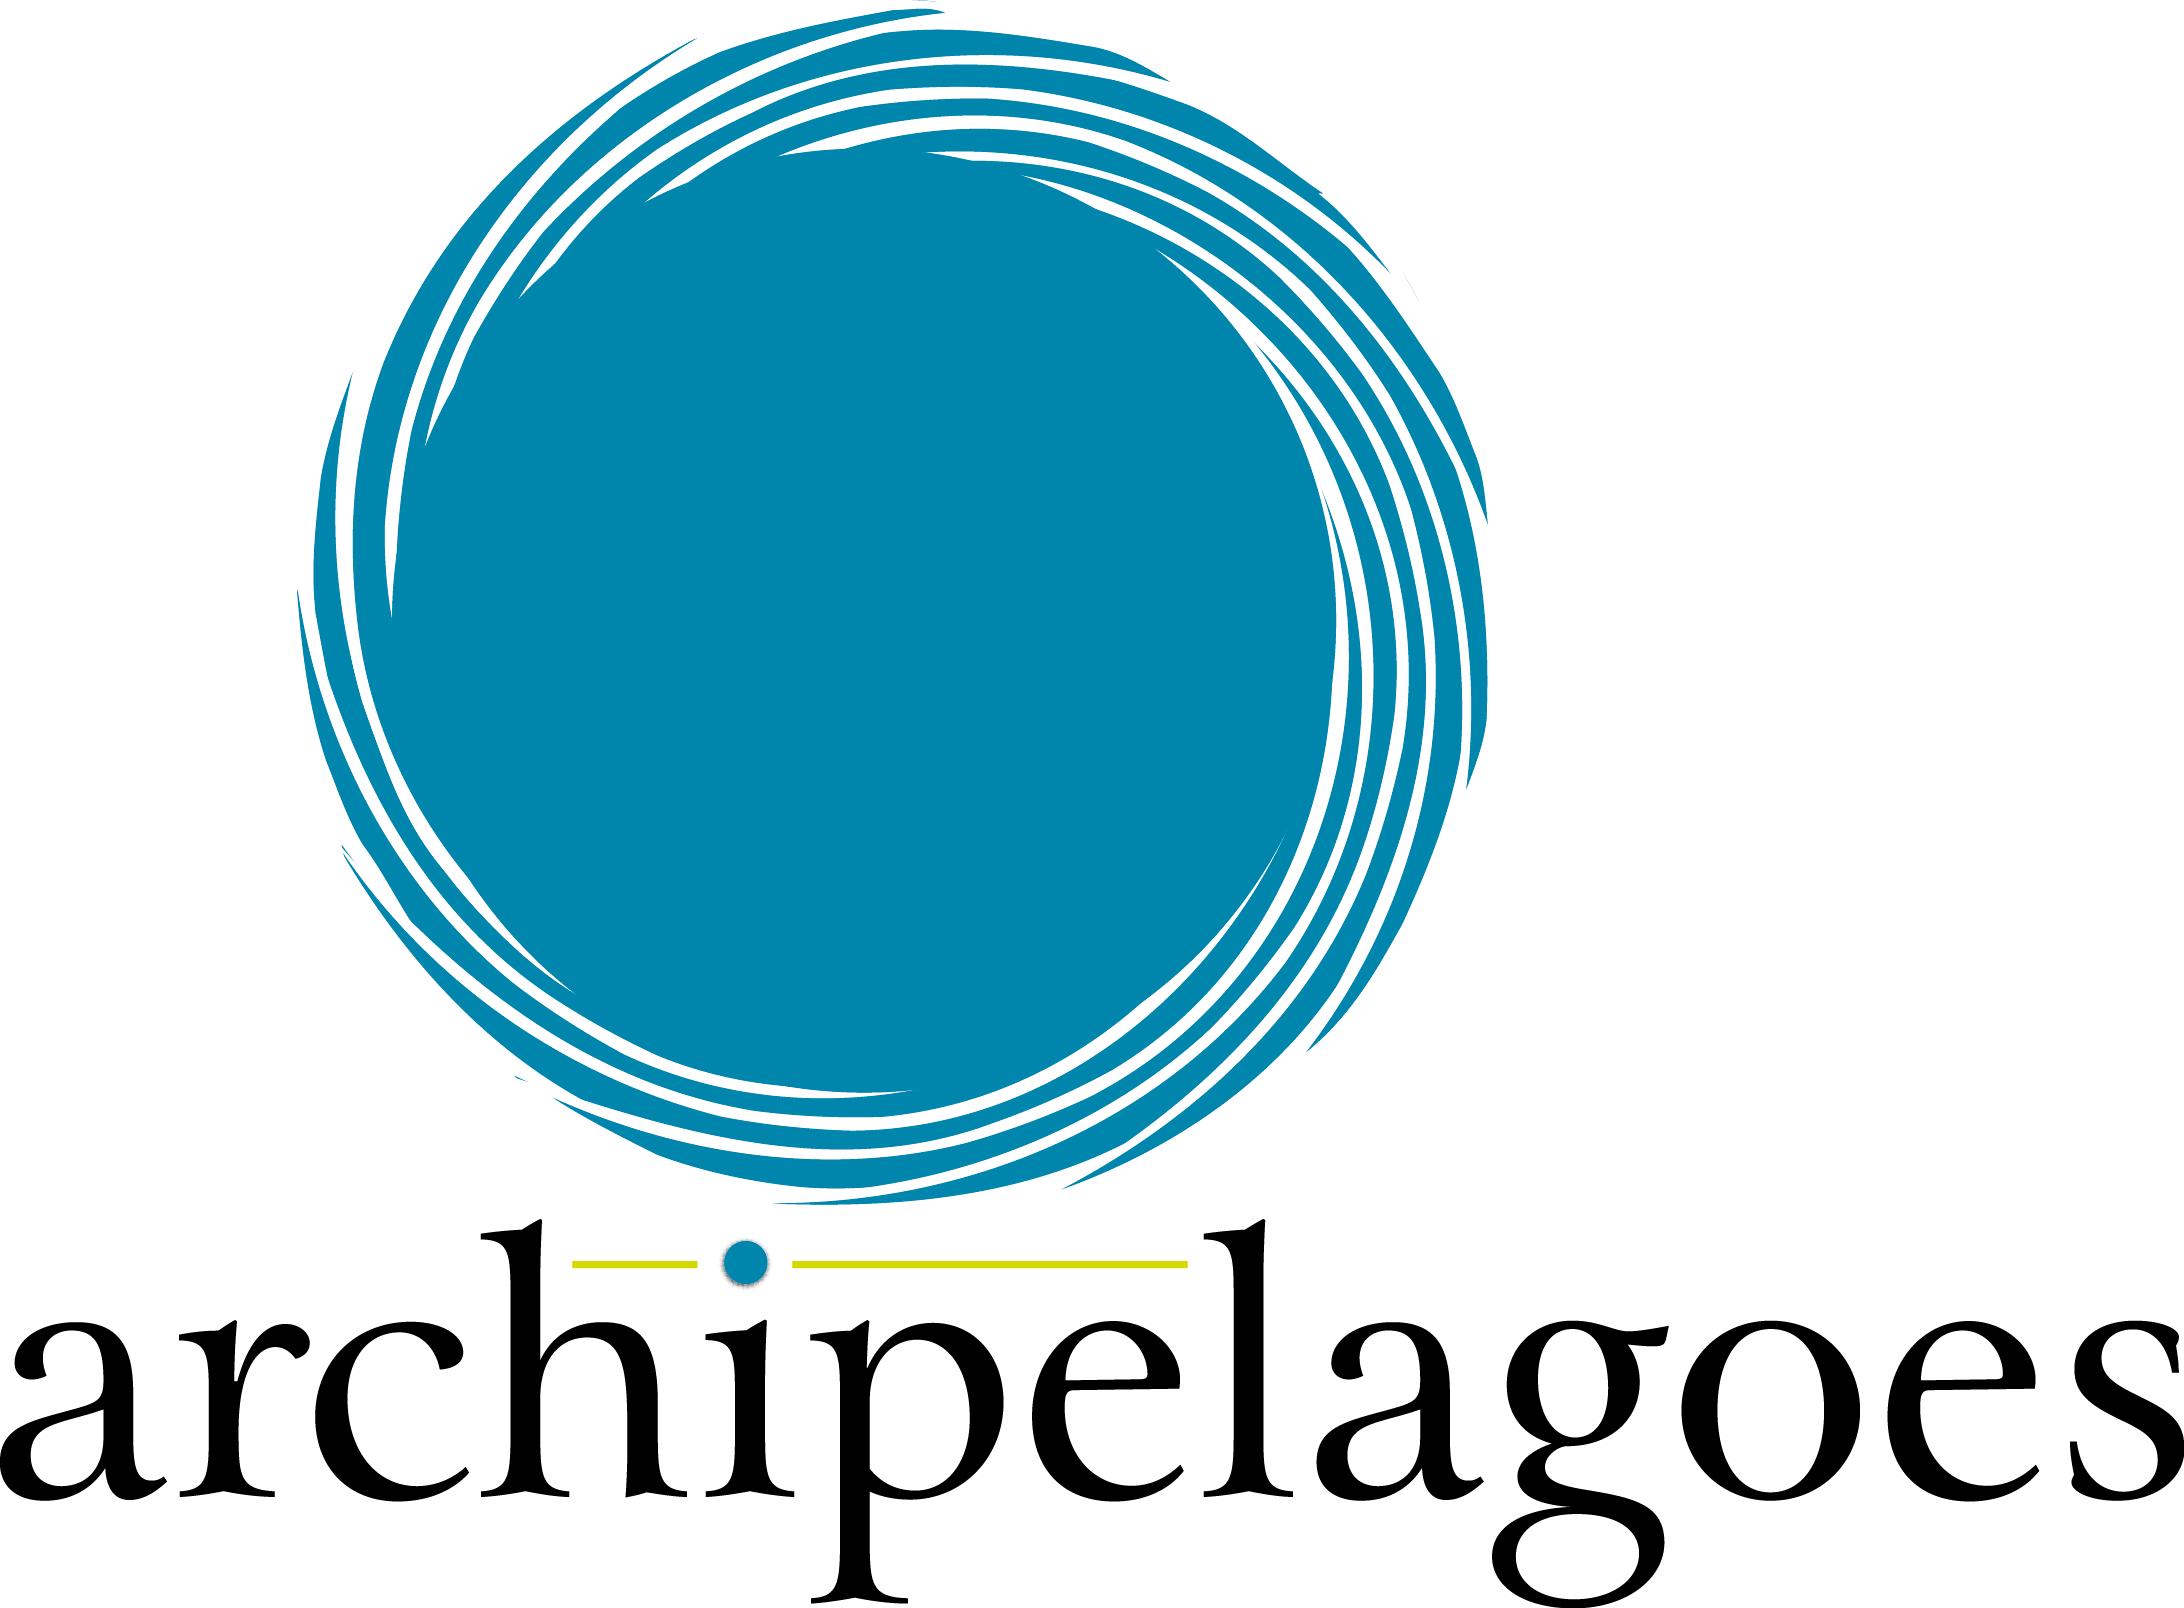 Archipelagoes.eps.png